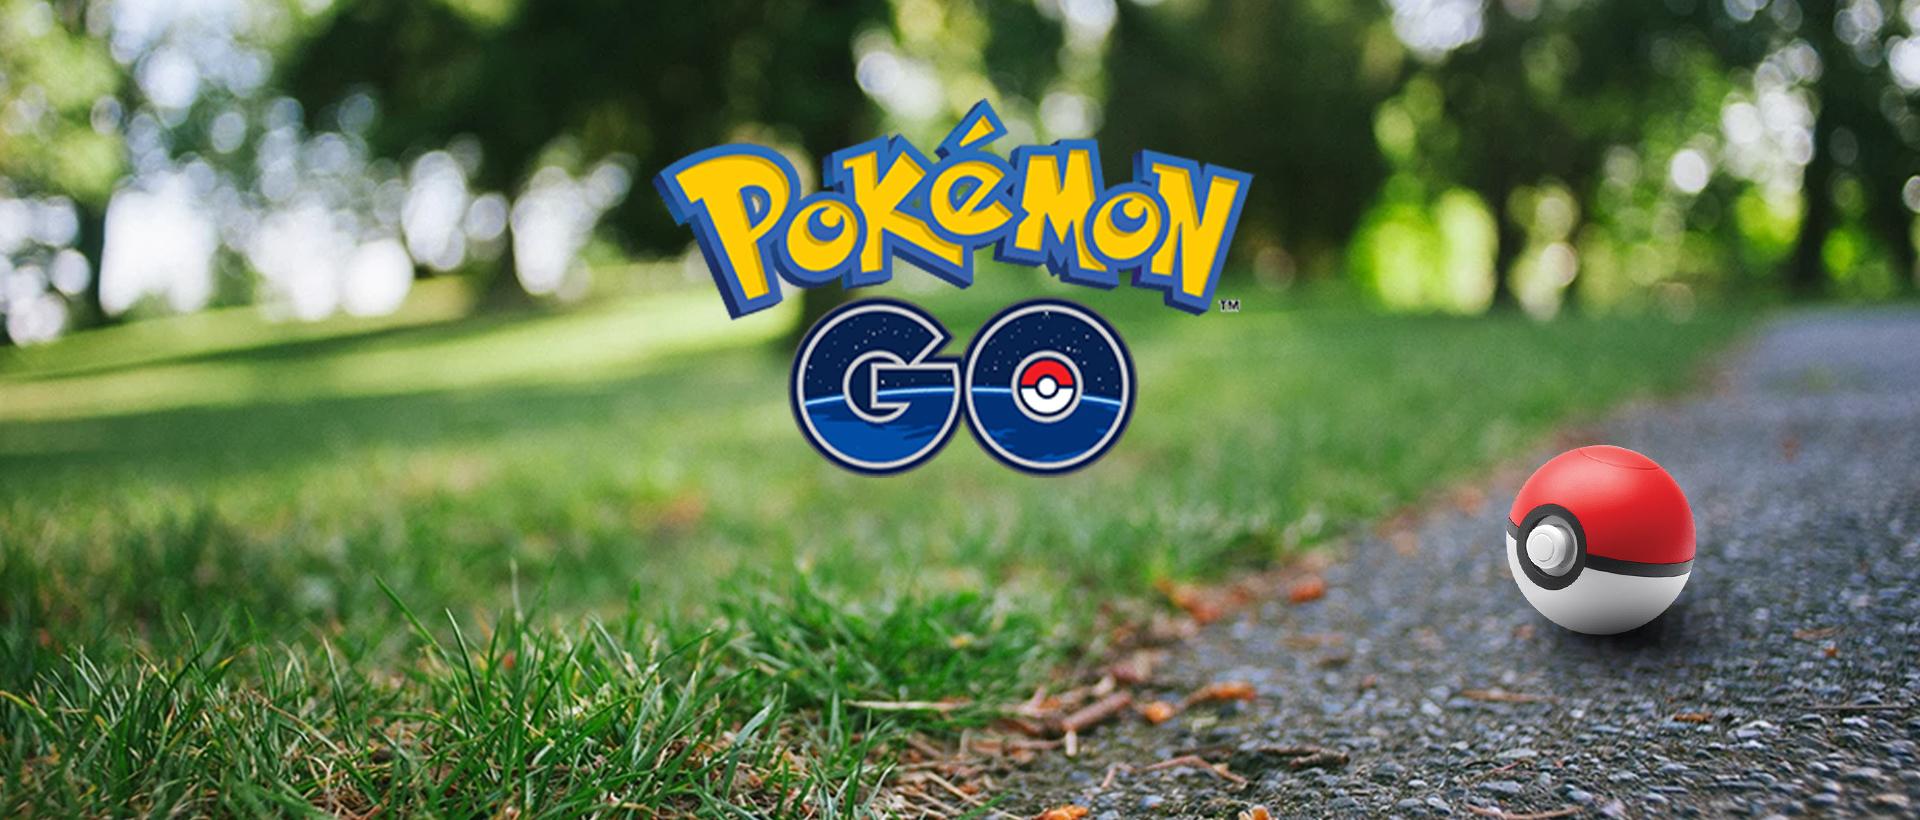 Pokémon GO寶可夢